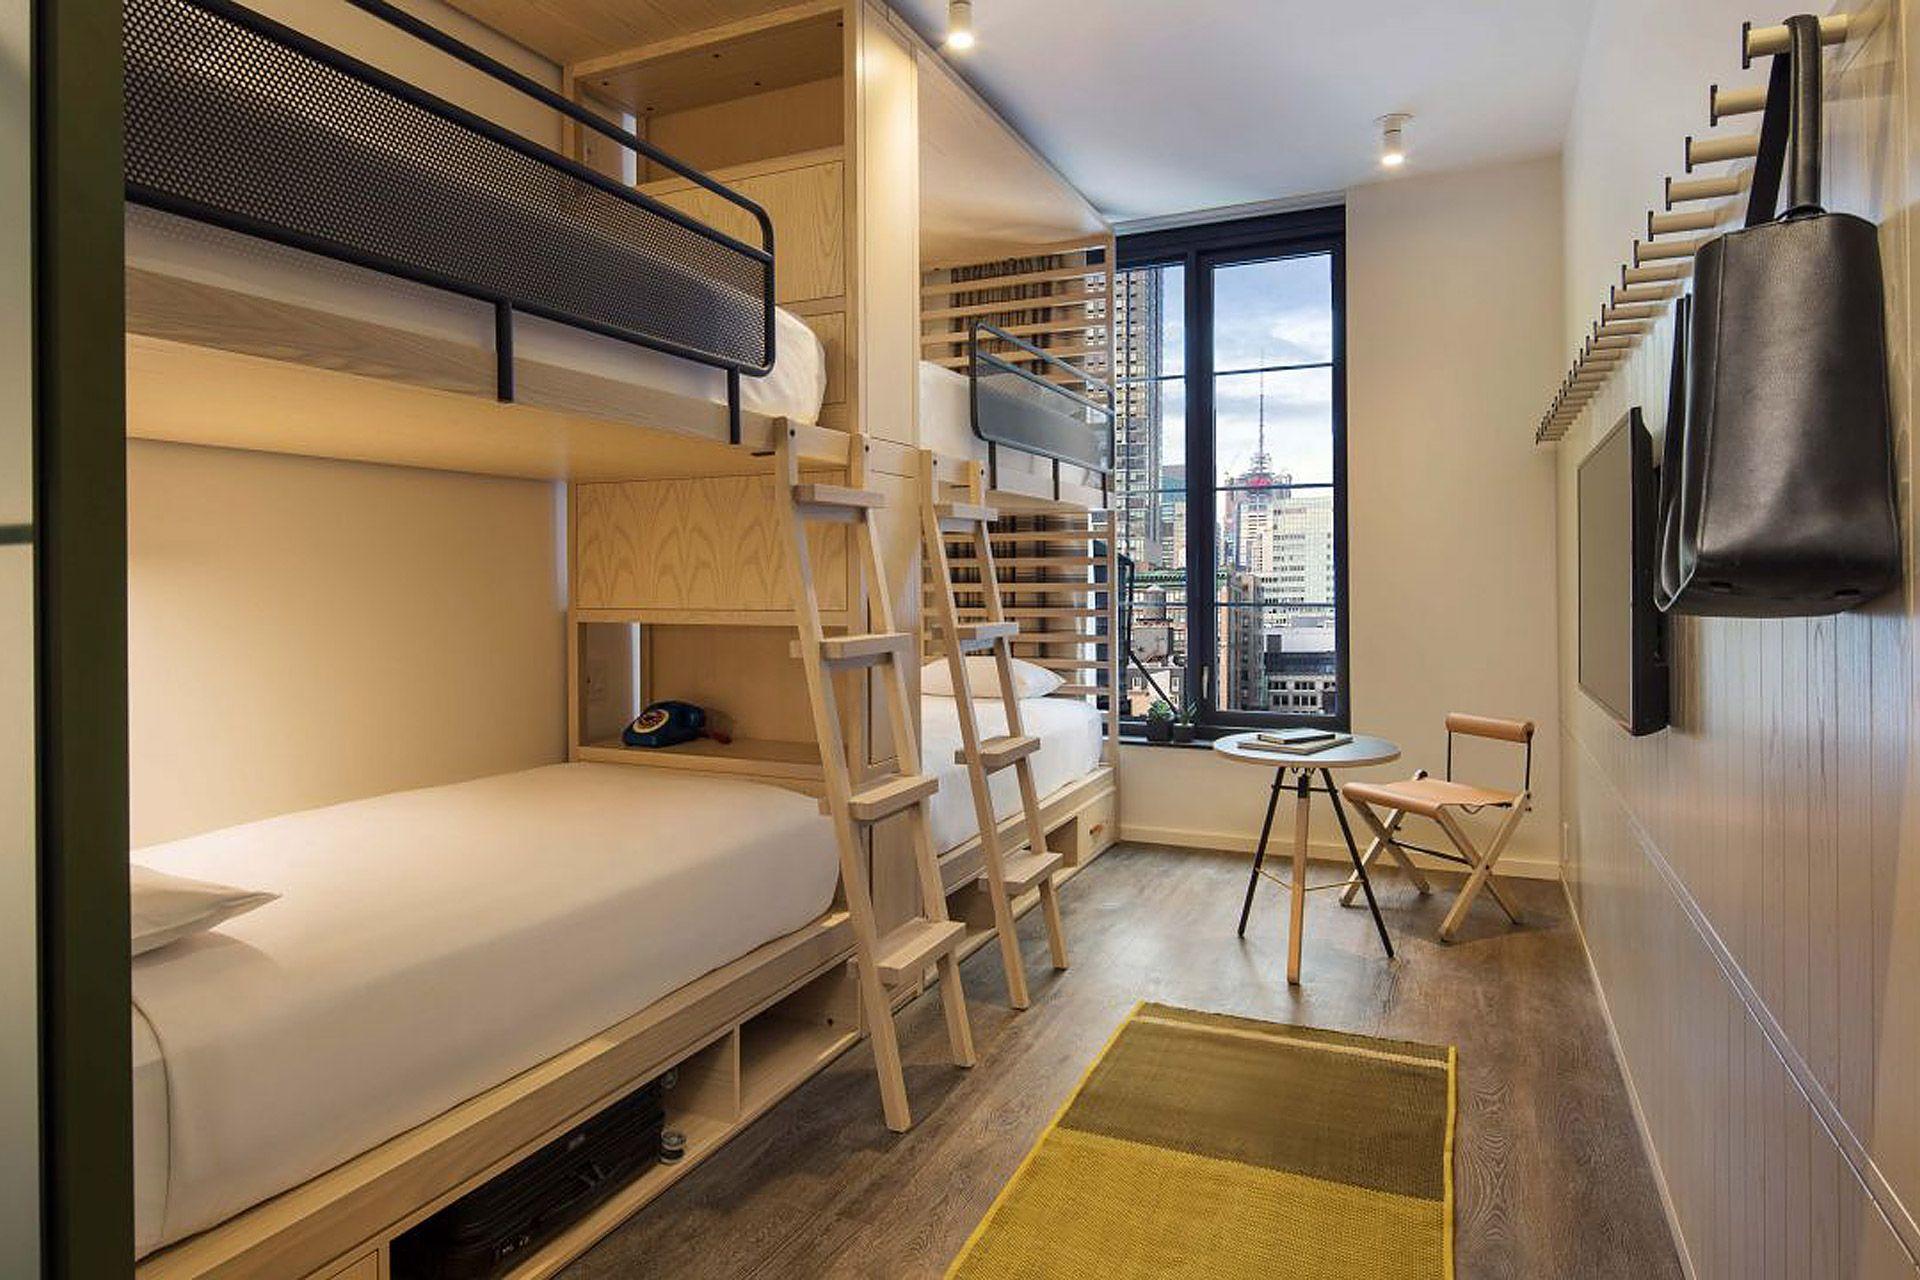 Moxy Chelsea Hotel In 2020 Hotels Room Bunk Beds Chelsea Hotel